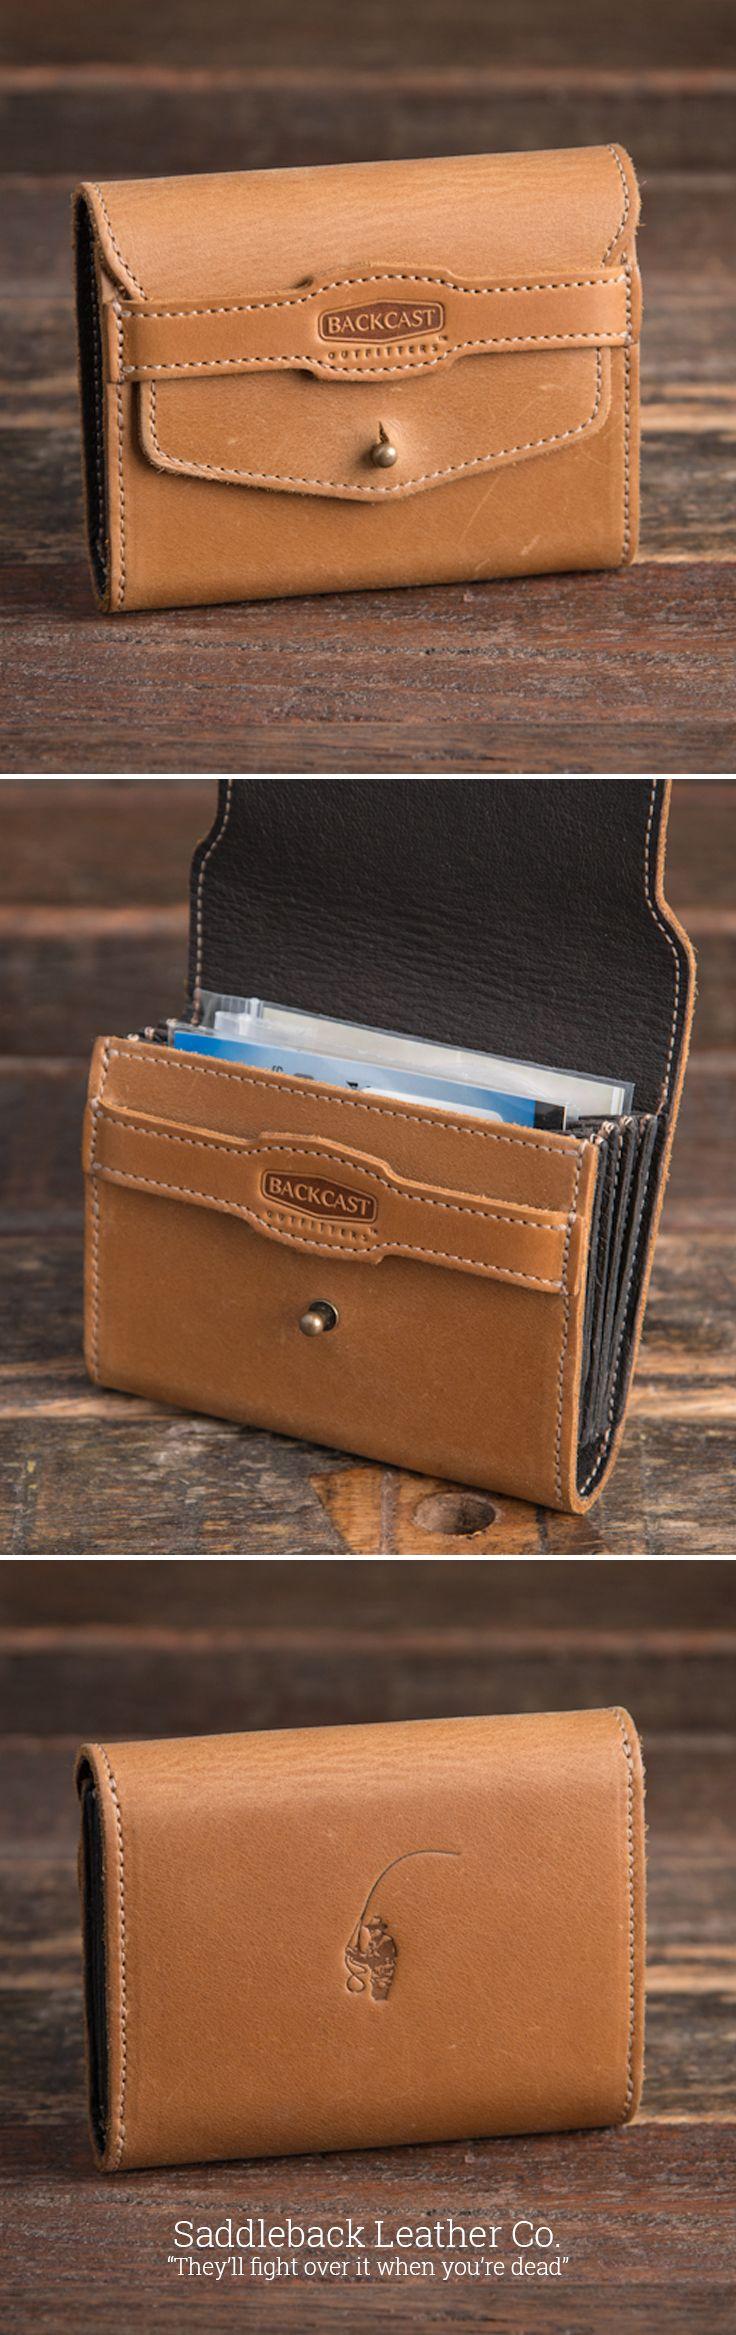 The new 5 Pocket Leader Wallet | Full Grain Leather | 100 Year Warranty | $84.00